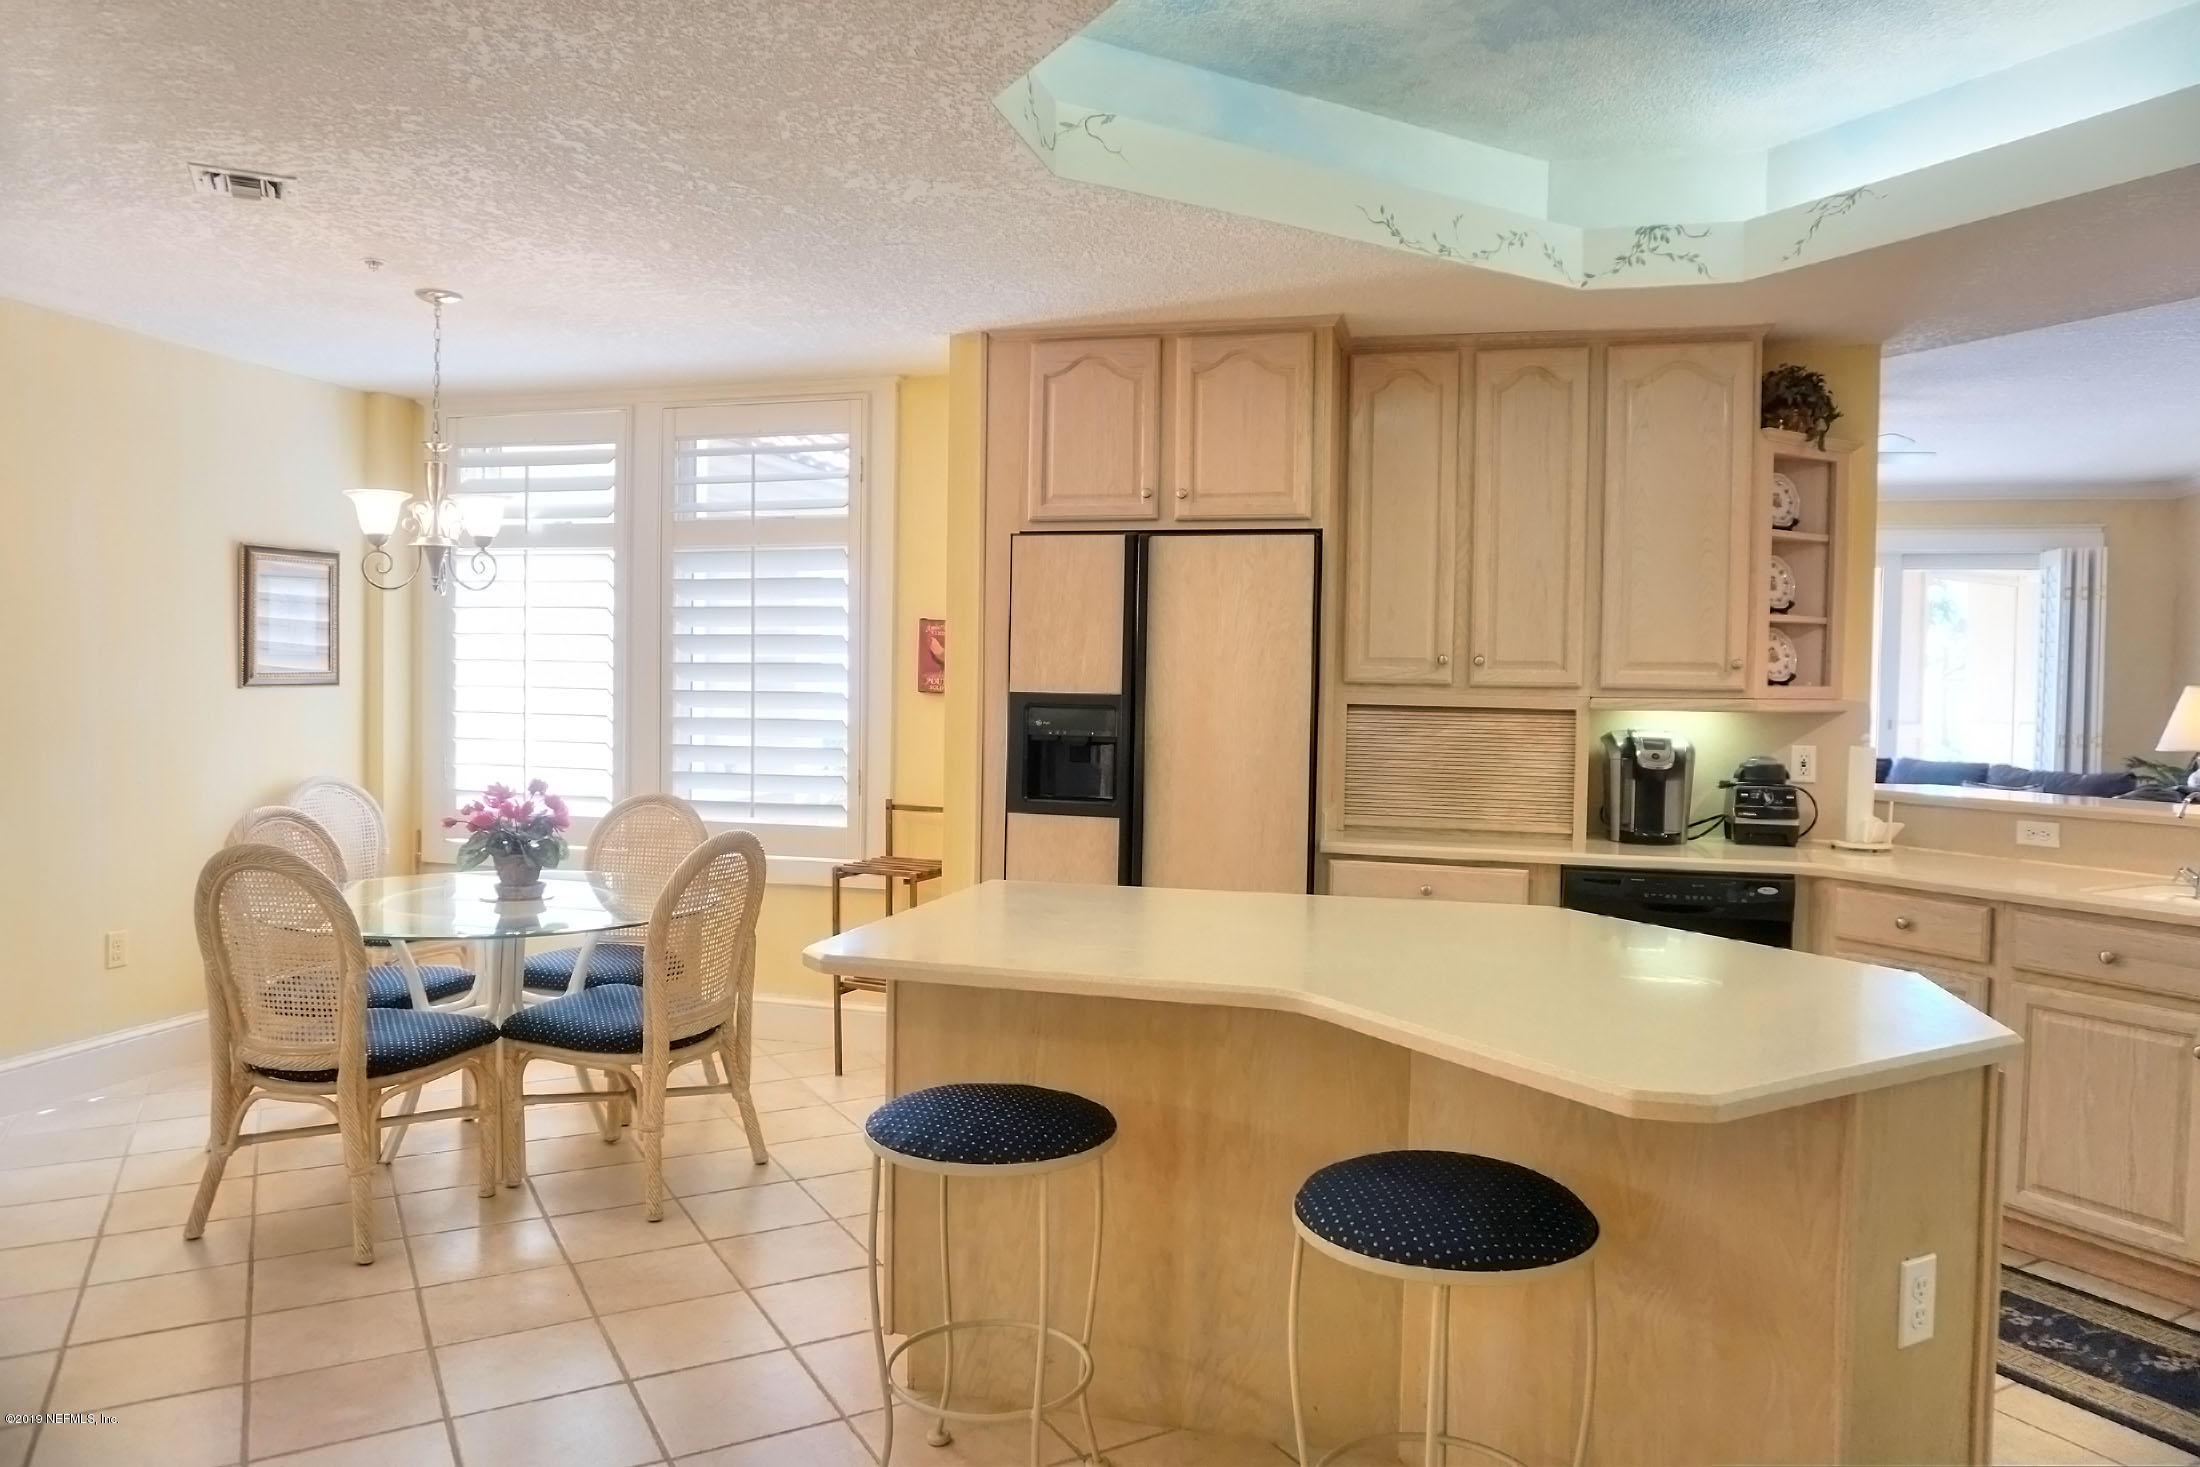 422 BEACHSIDE, FERNANDINA BEACH, FLORIDA 32034, 3 Bedrooms Bedrooms, ,3 BathroomsBathrooms,Residential - condos/townhomes,For sale,BEACHSIDE,979145